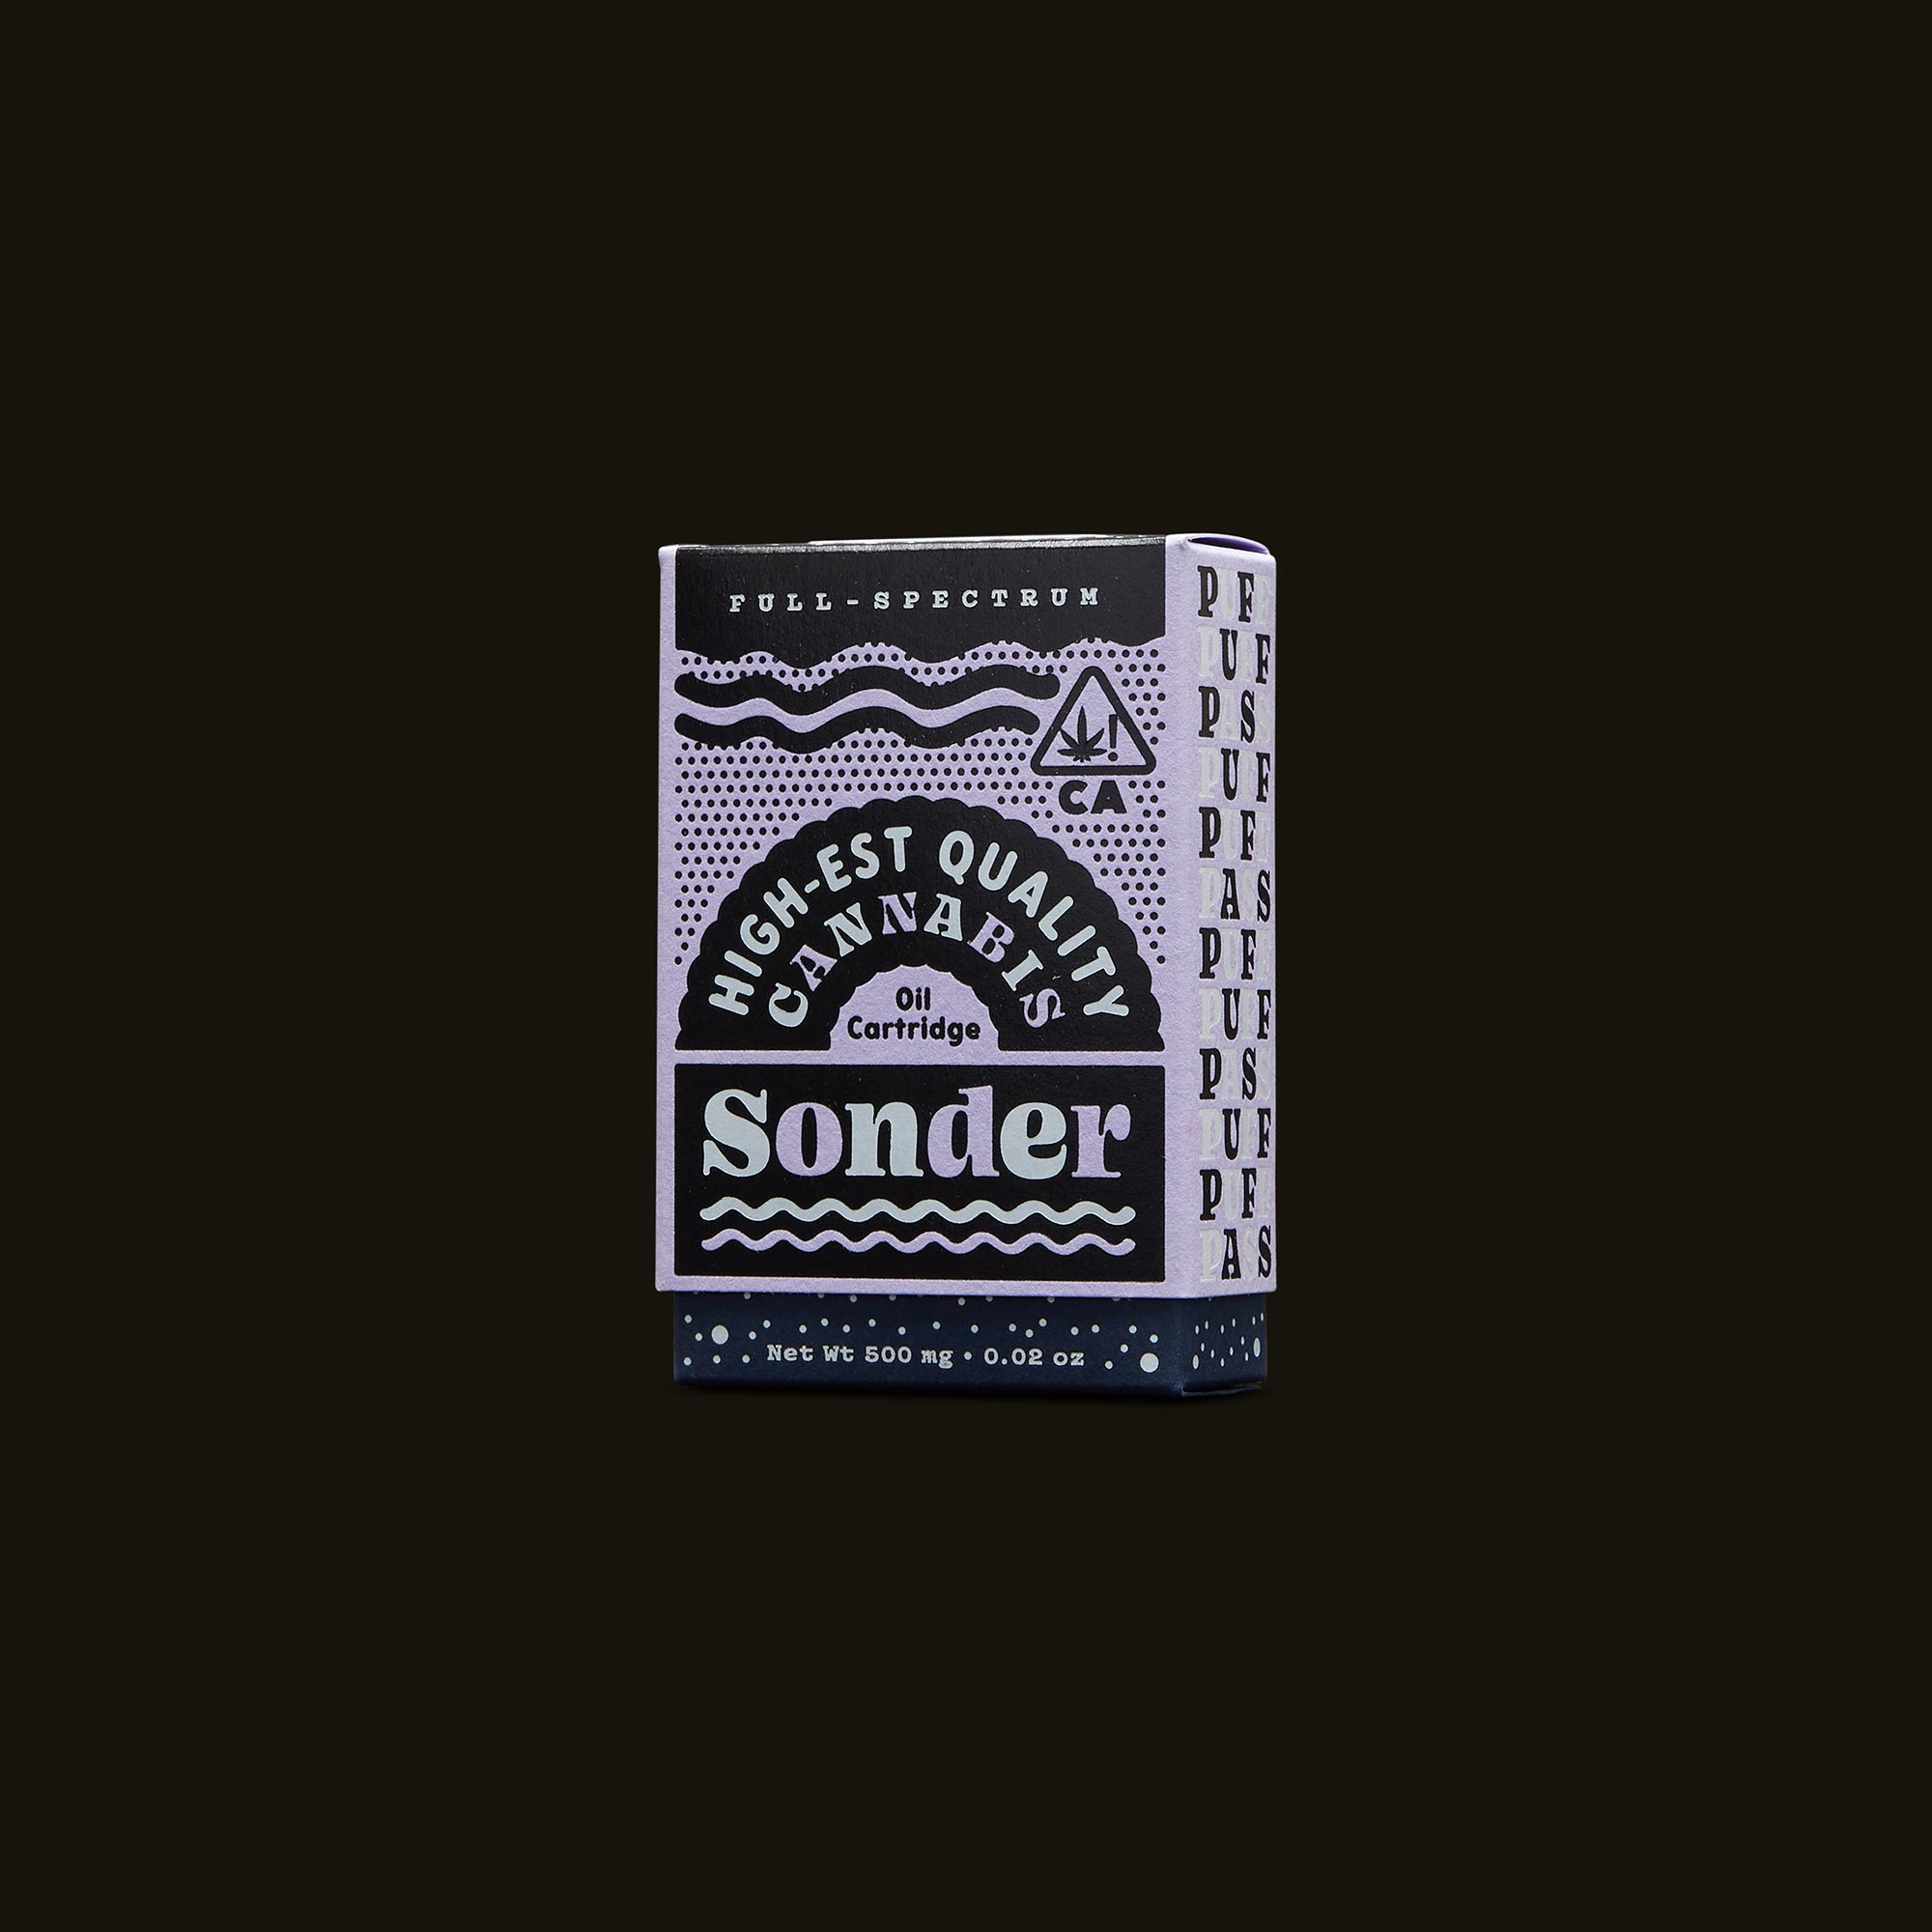 Sonder Vape Pen - Gorilla No. 4 Cartridge